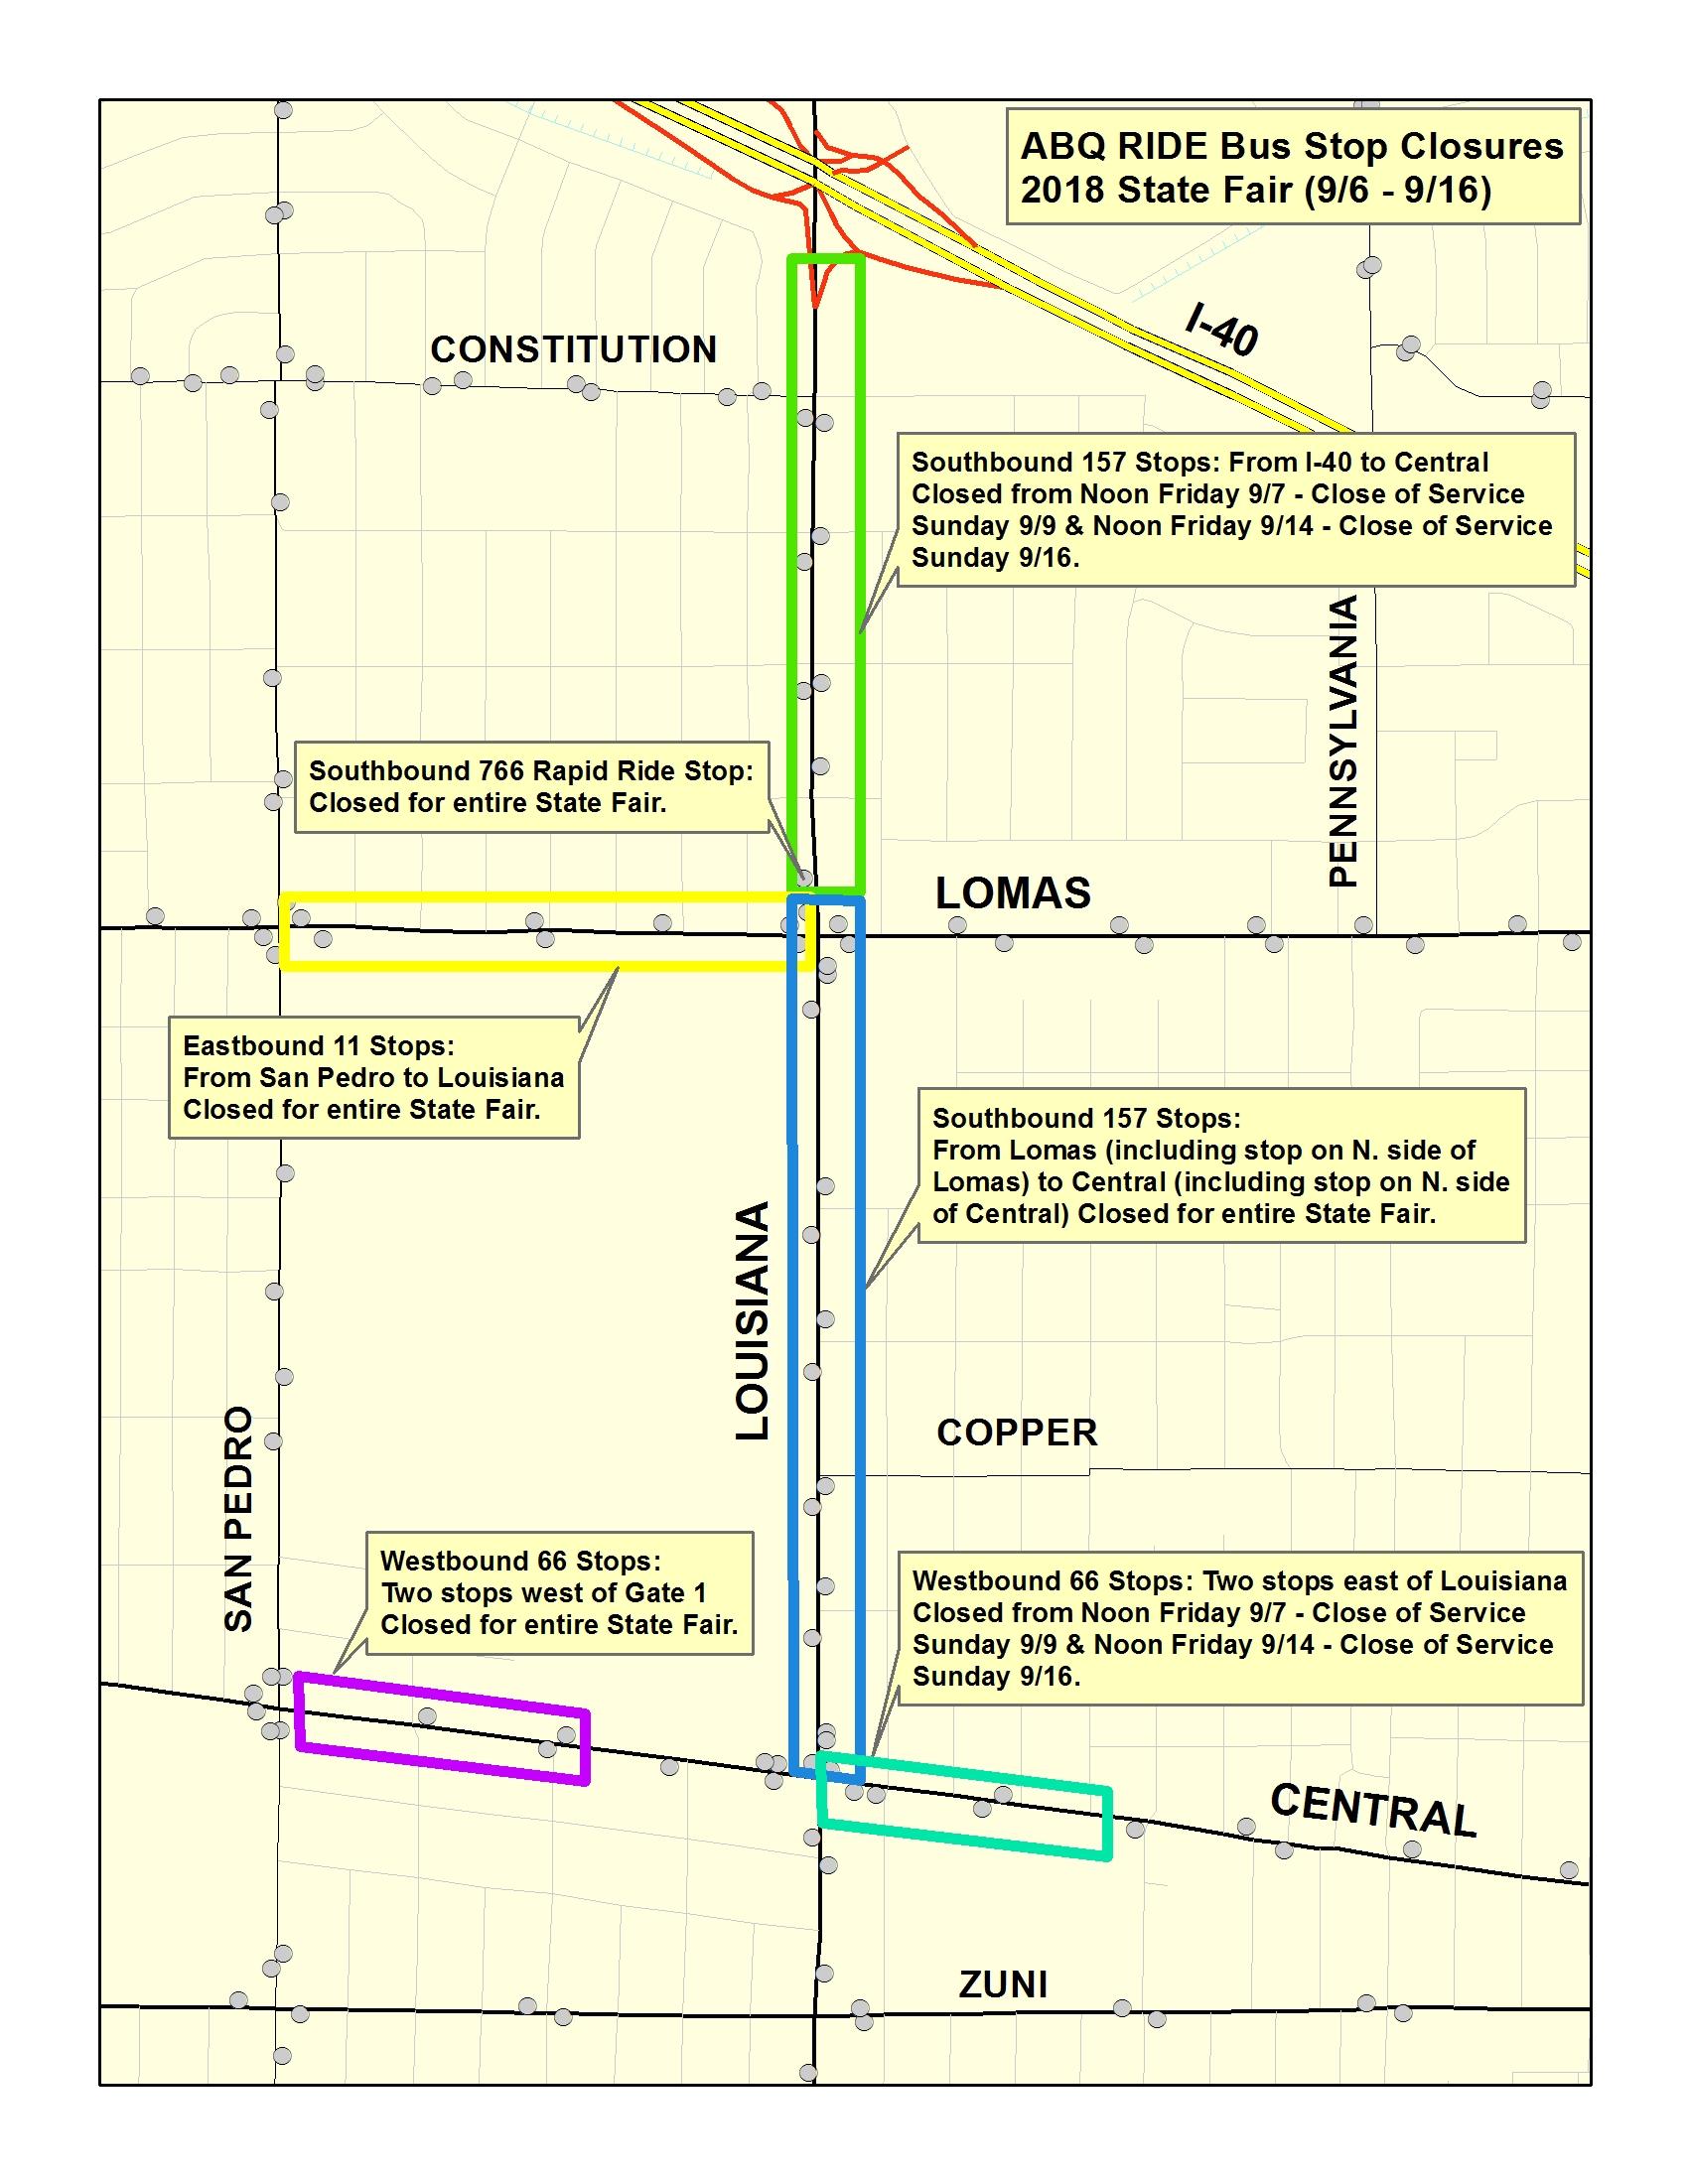 2018 State Fair bus stop closures.jpg